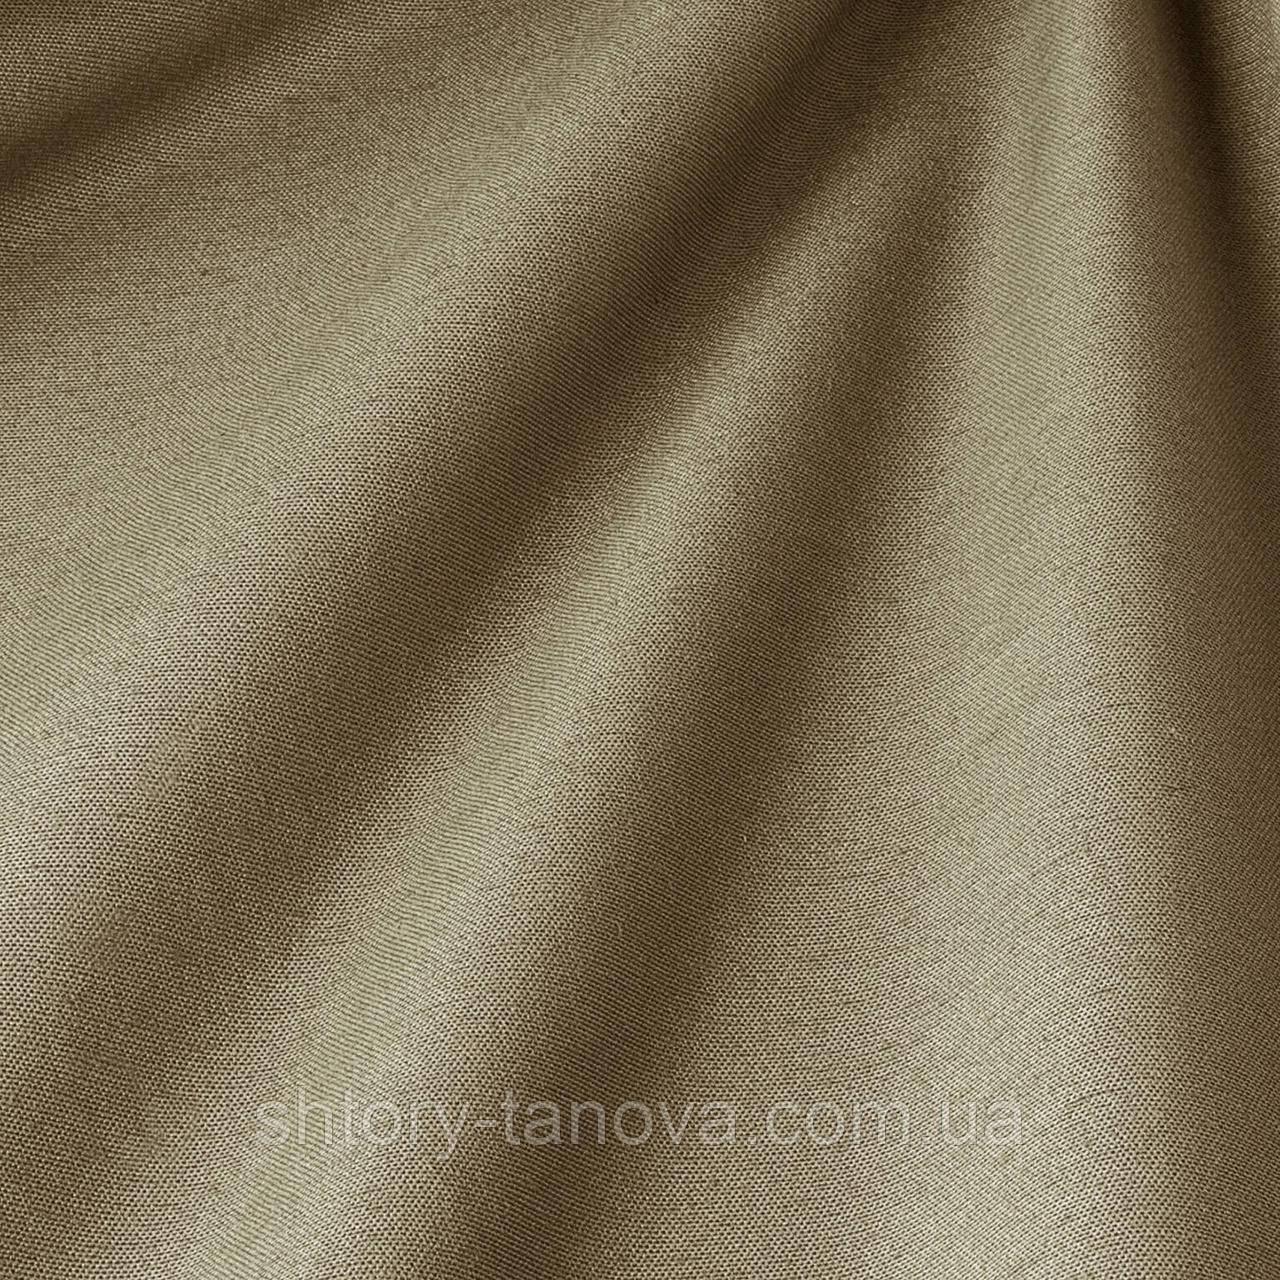 Декоративная ткань однотонная, бежево-серый